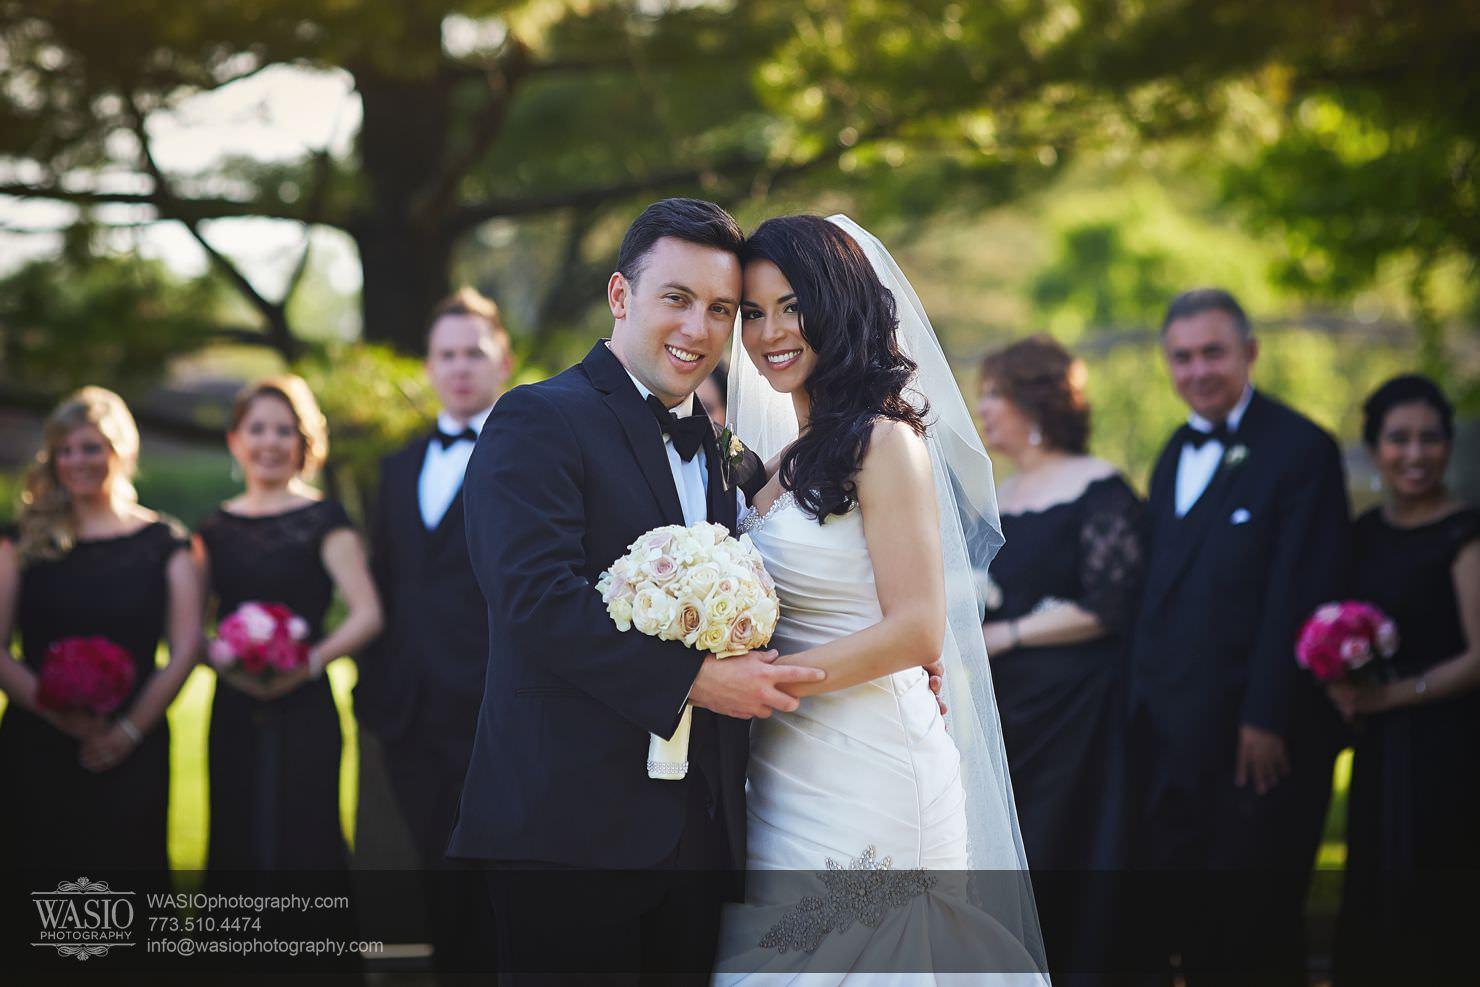 033_Chicago-Spring-Wedding_Chrissy-Andrew_3P4C5892 Chicago Spring Wedding - Chrissy + Andrew